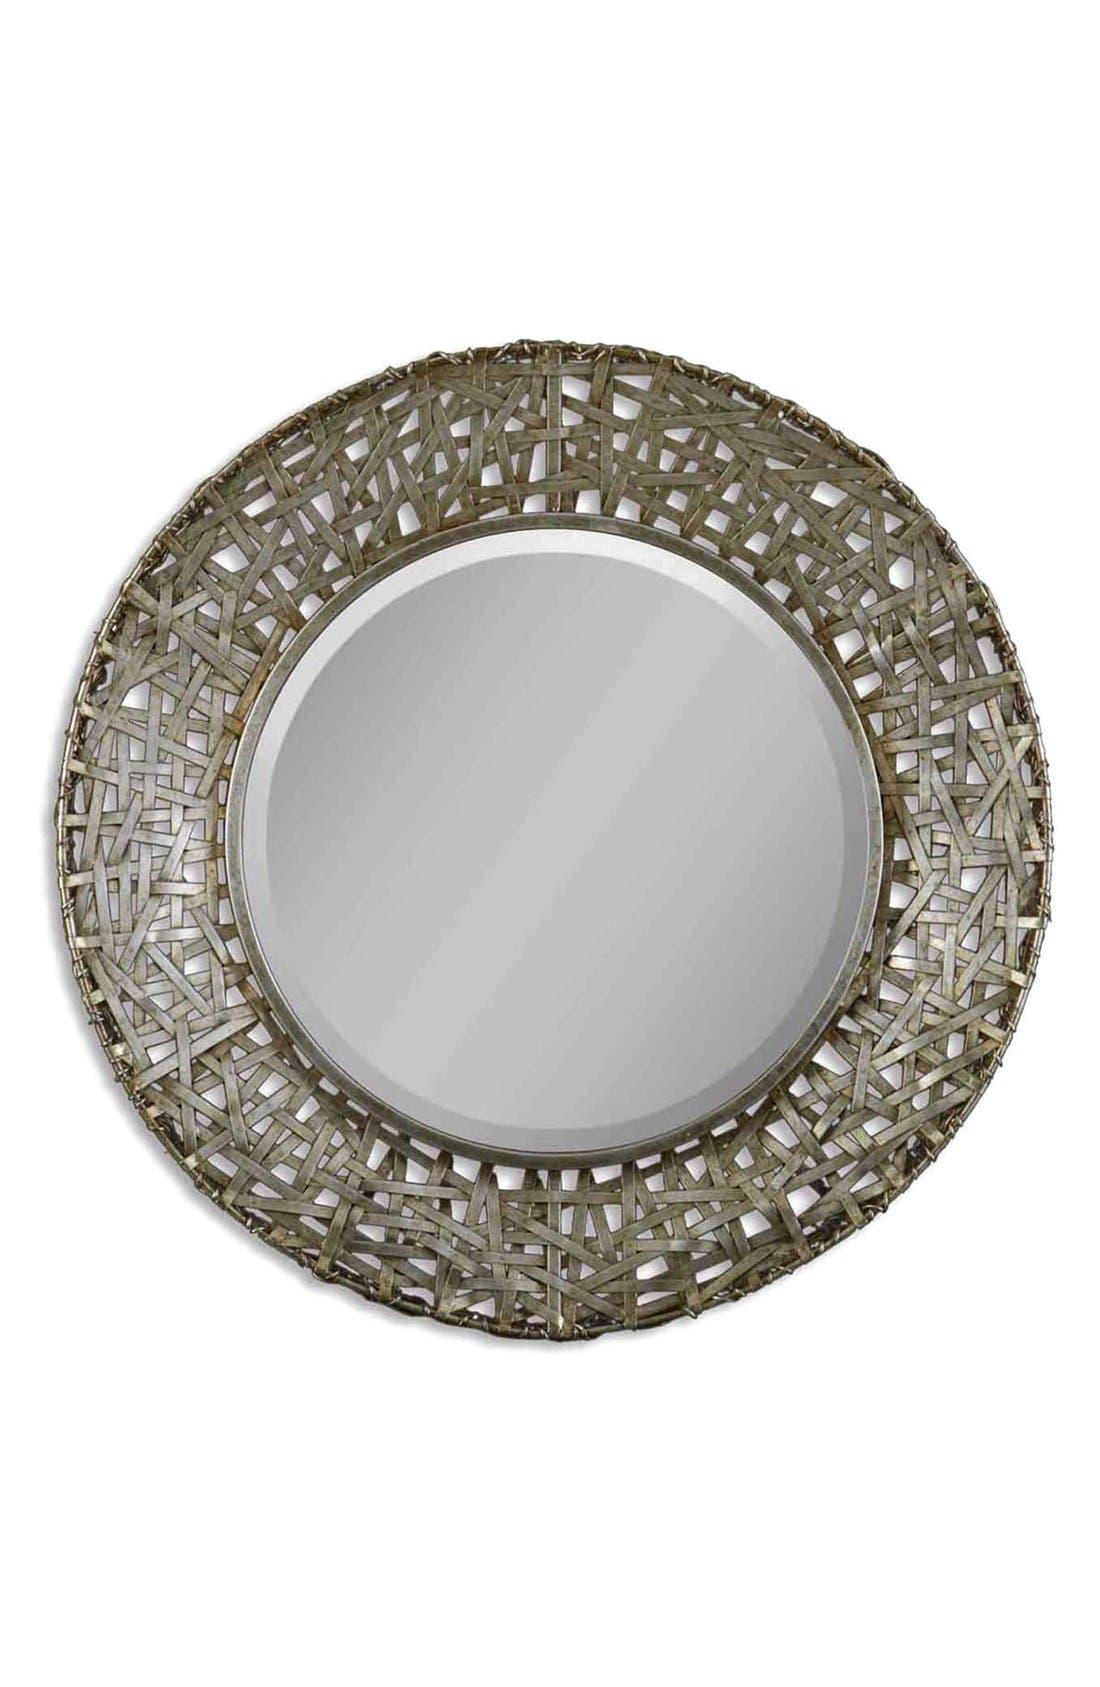 Alternate Image 1 Selected - Uttermost 'Alita' Woven Metallic Frame Mirror